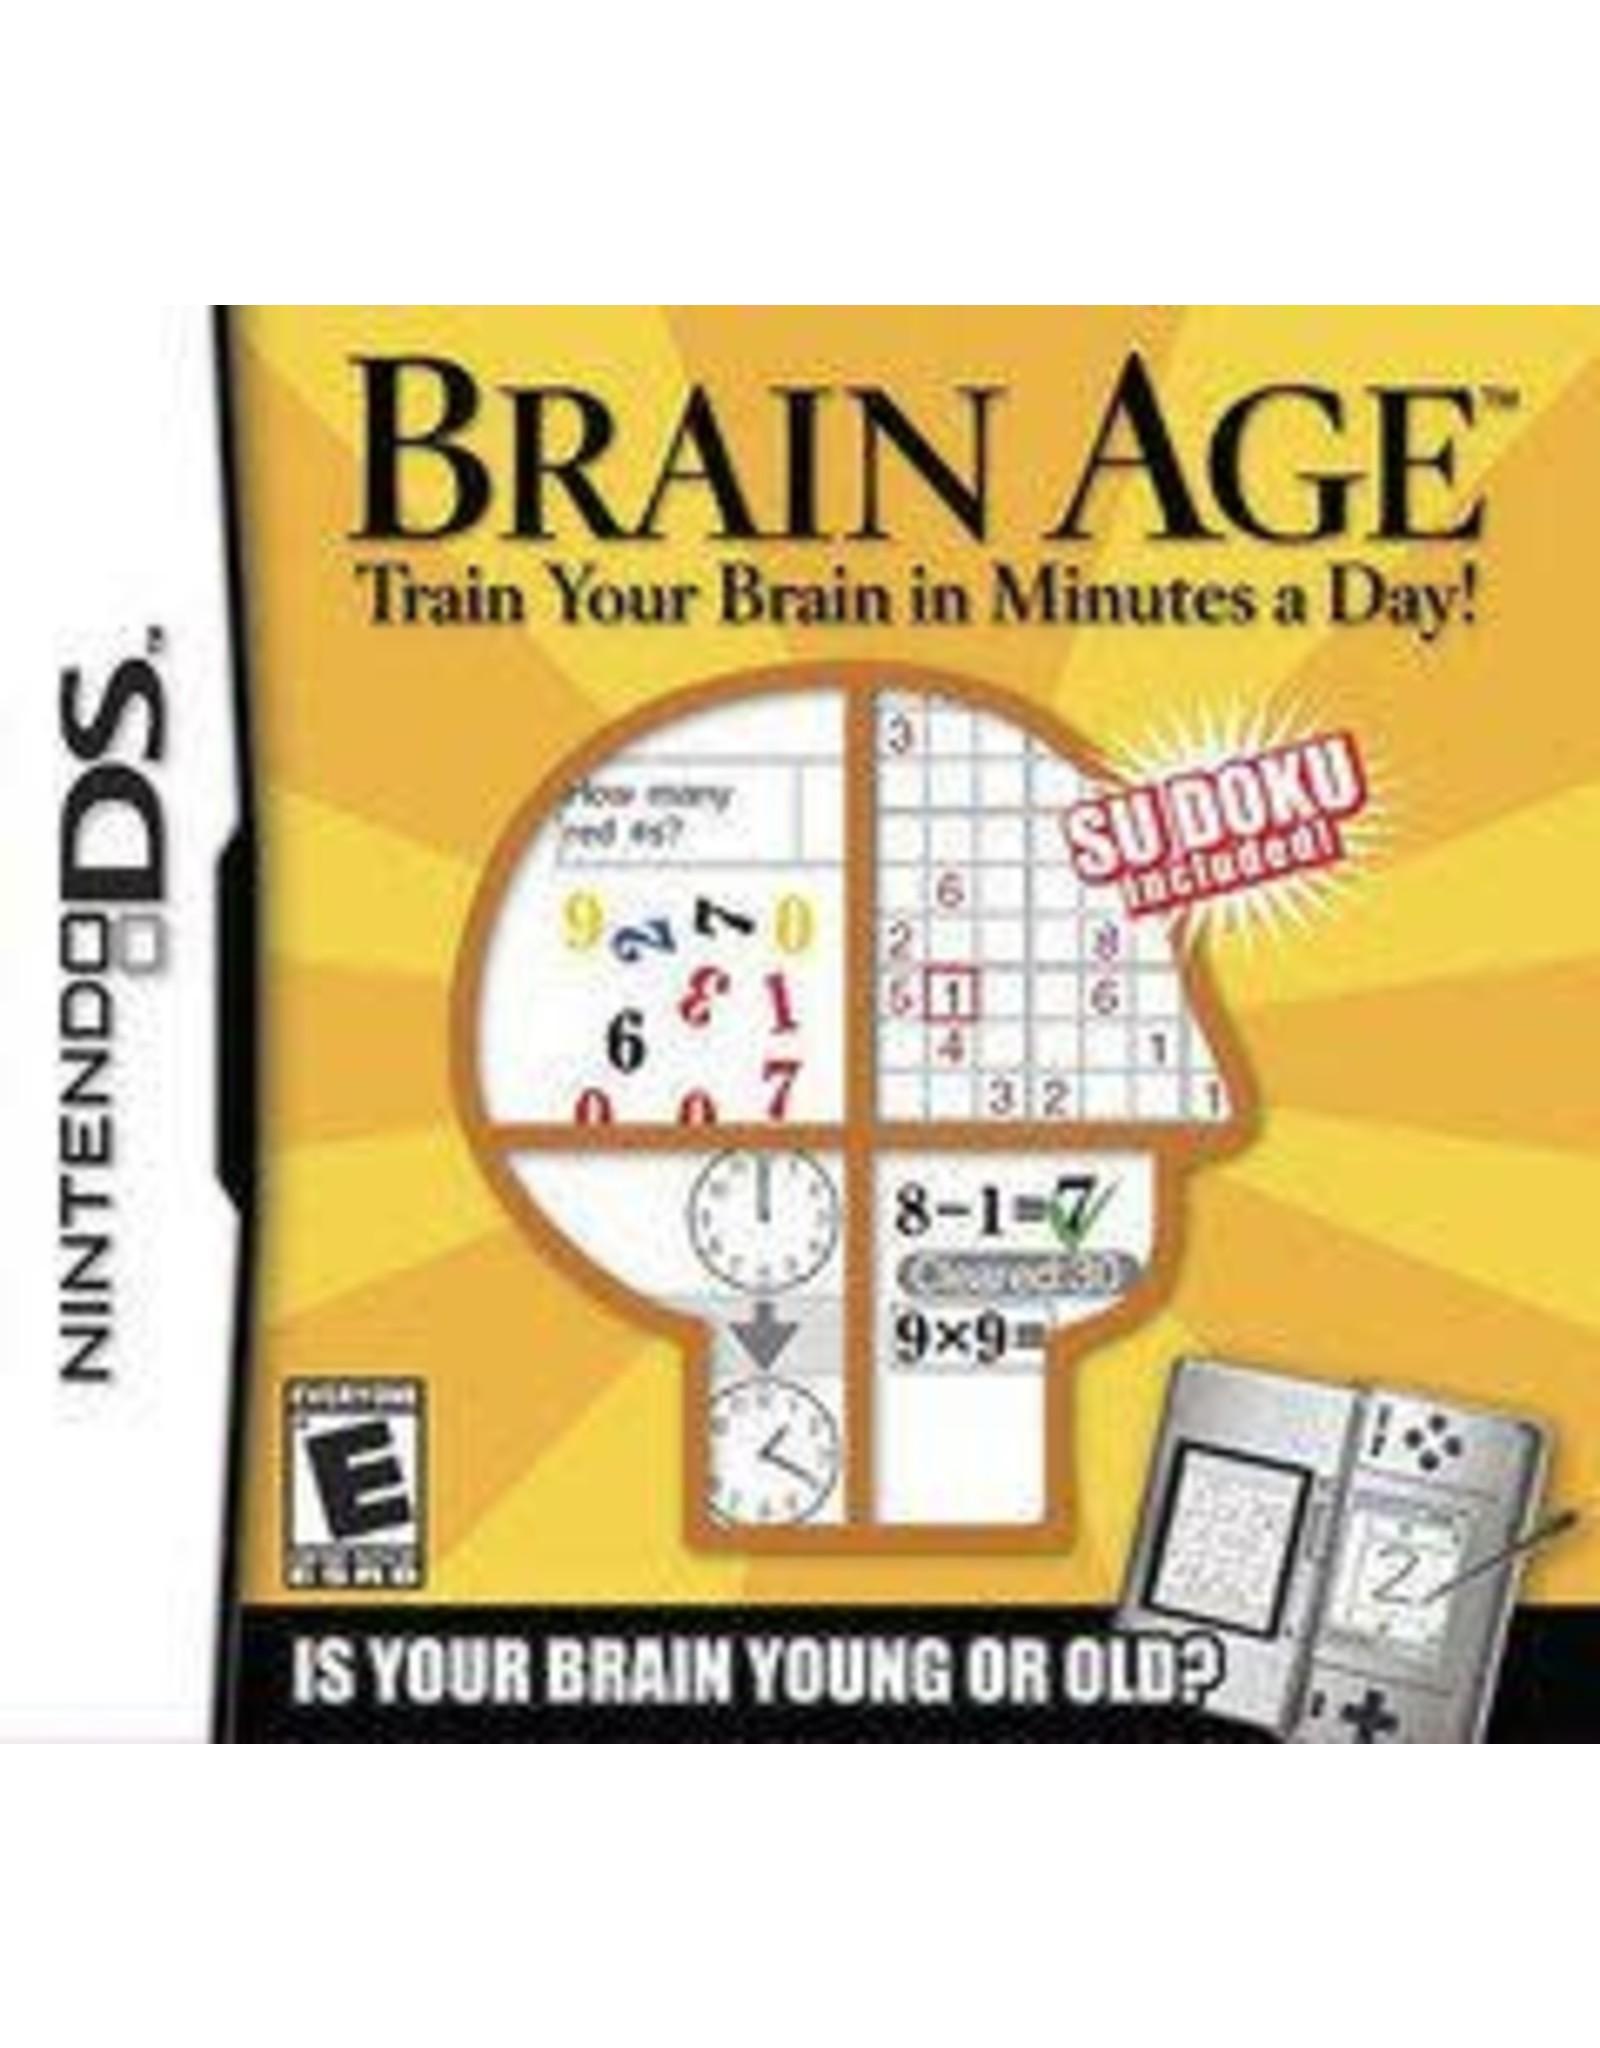 Nintendo DS Brain Age